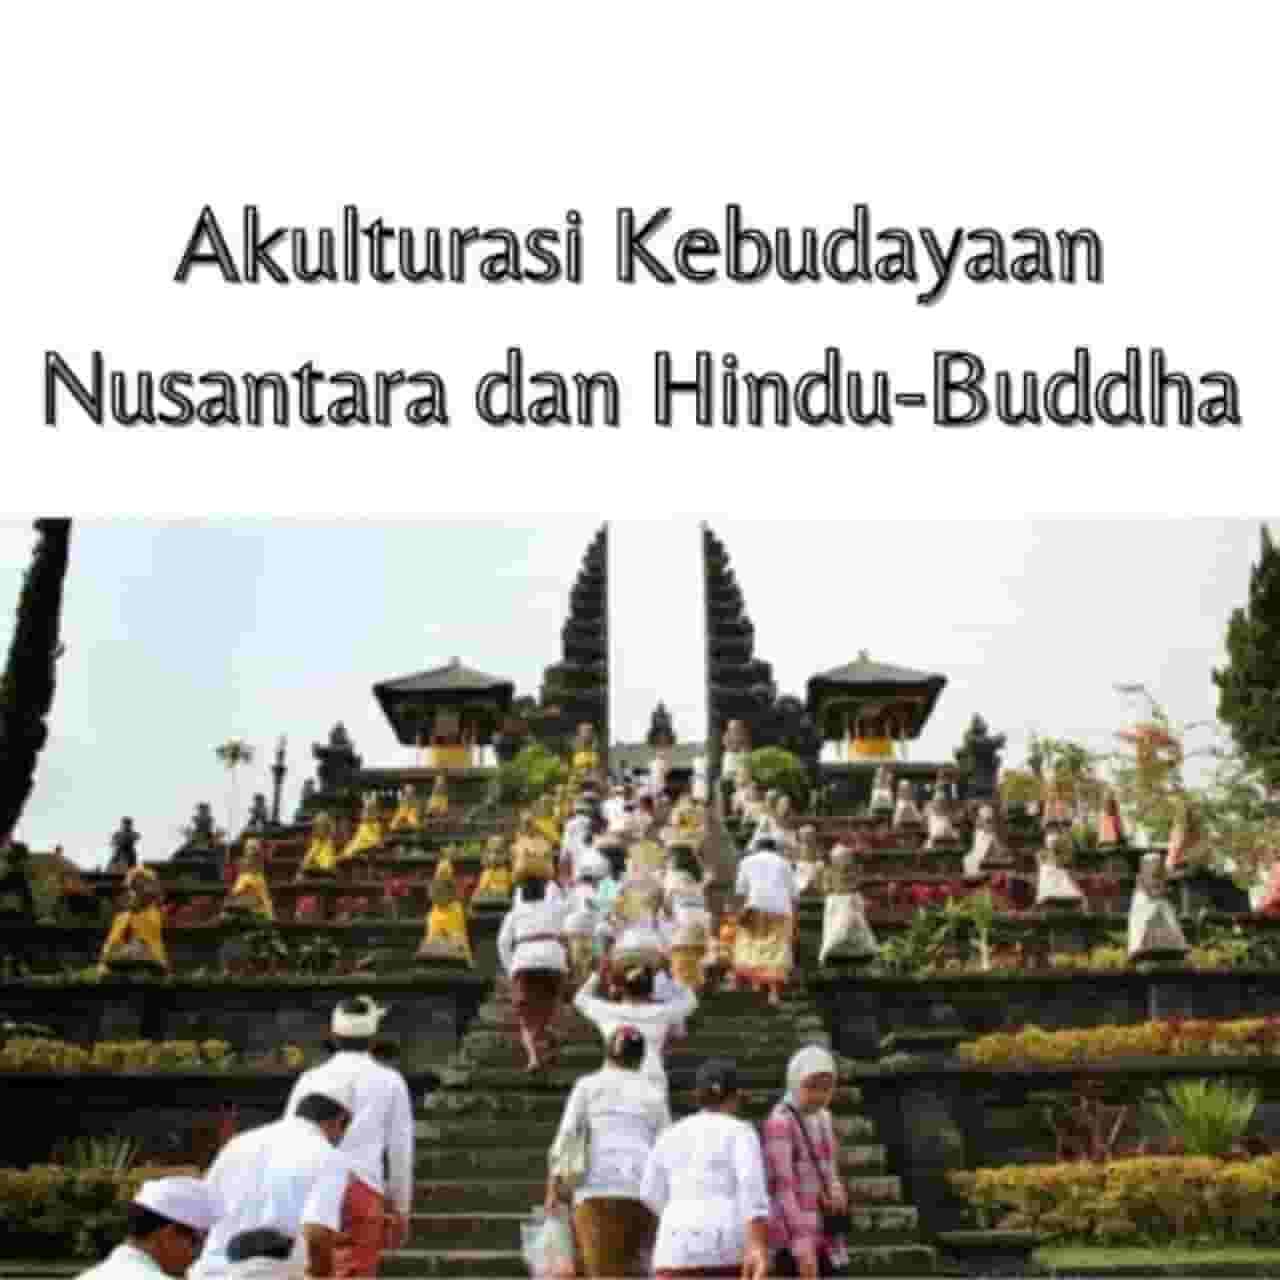 akulturasi Budaya copy 1280x1280 min